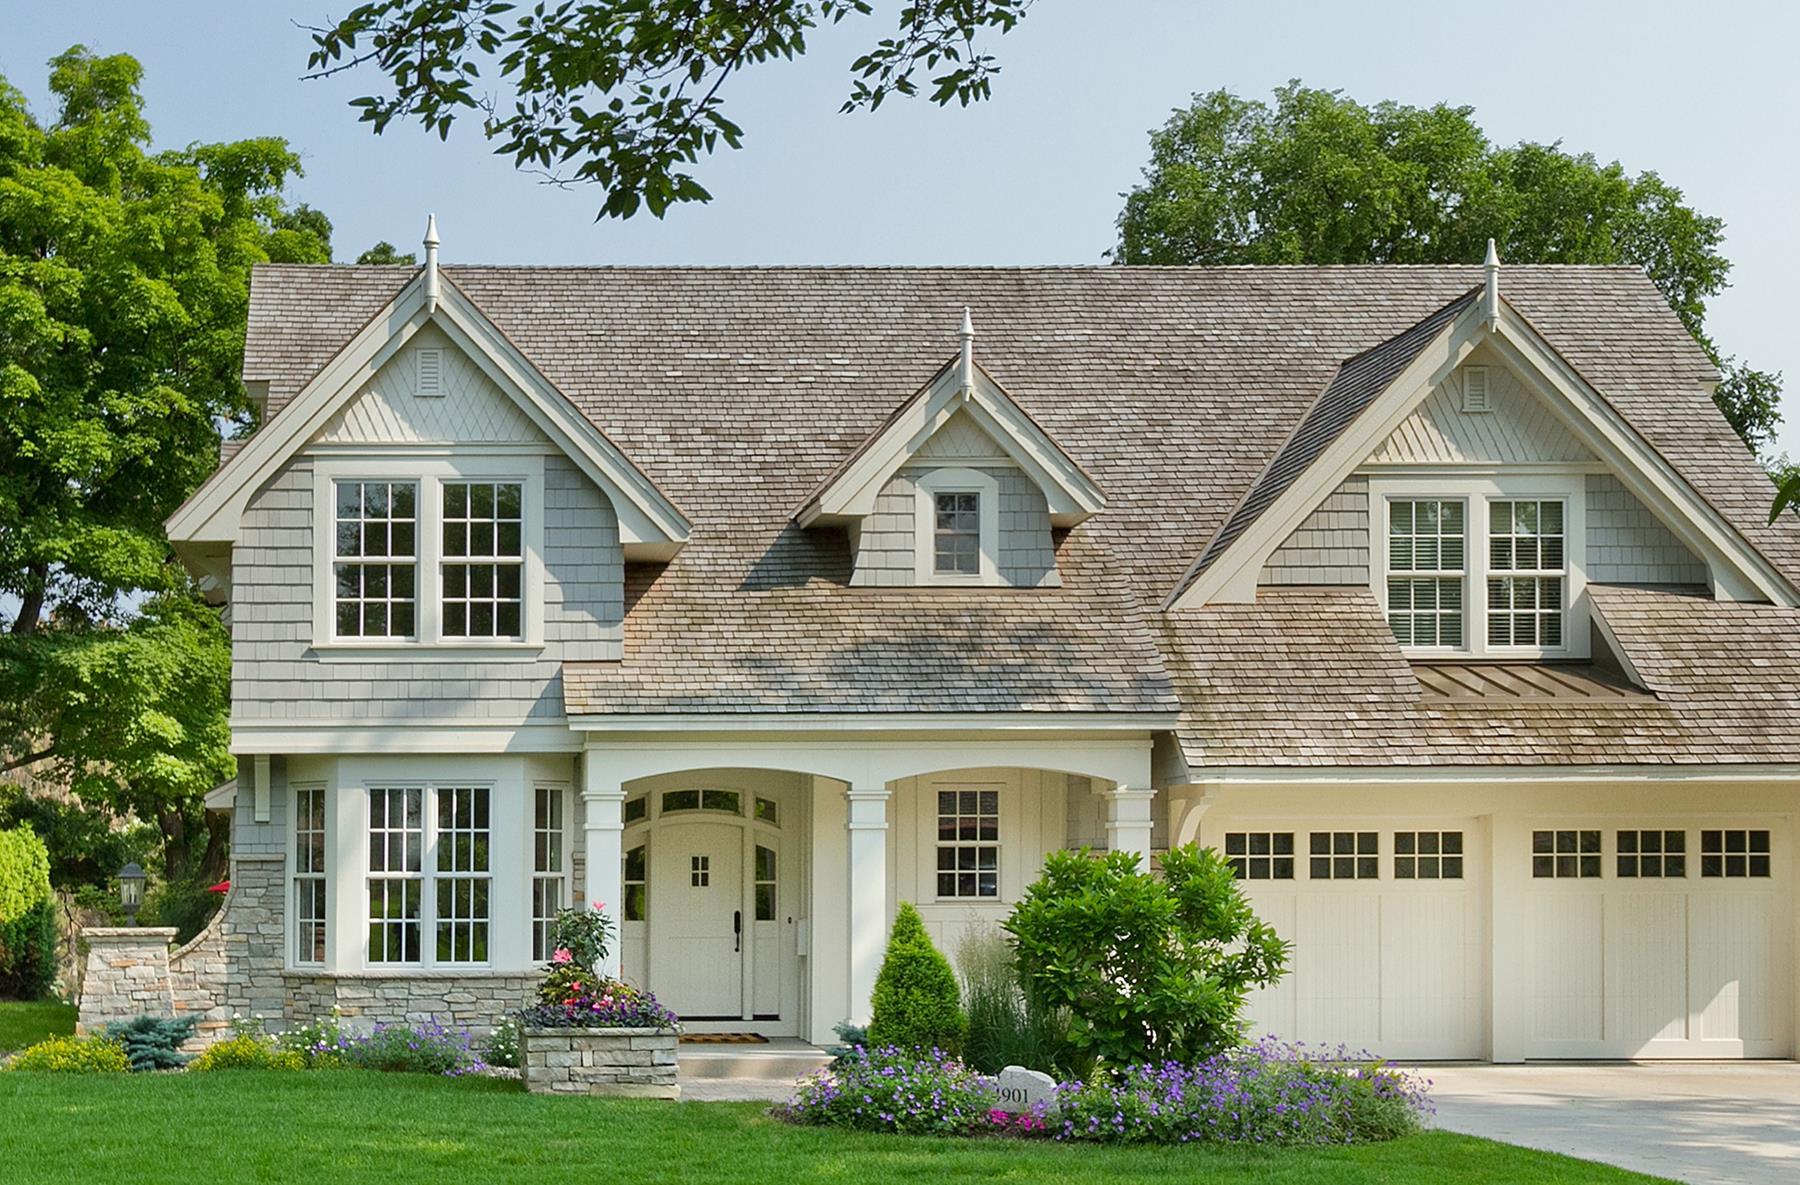 Single Family Home for Sale at 4617 Golf Terrace Edina, Minnesota 55424 United States